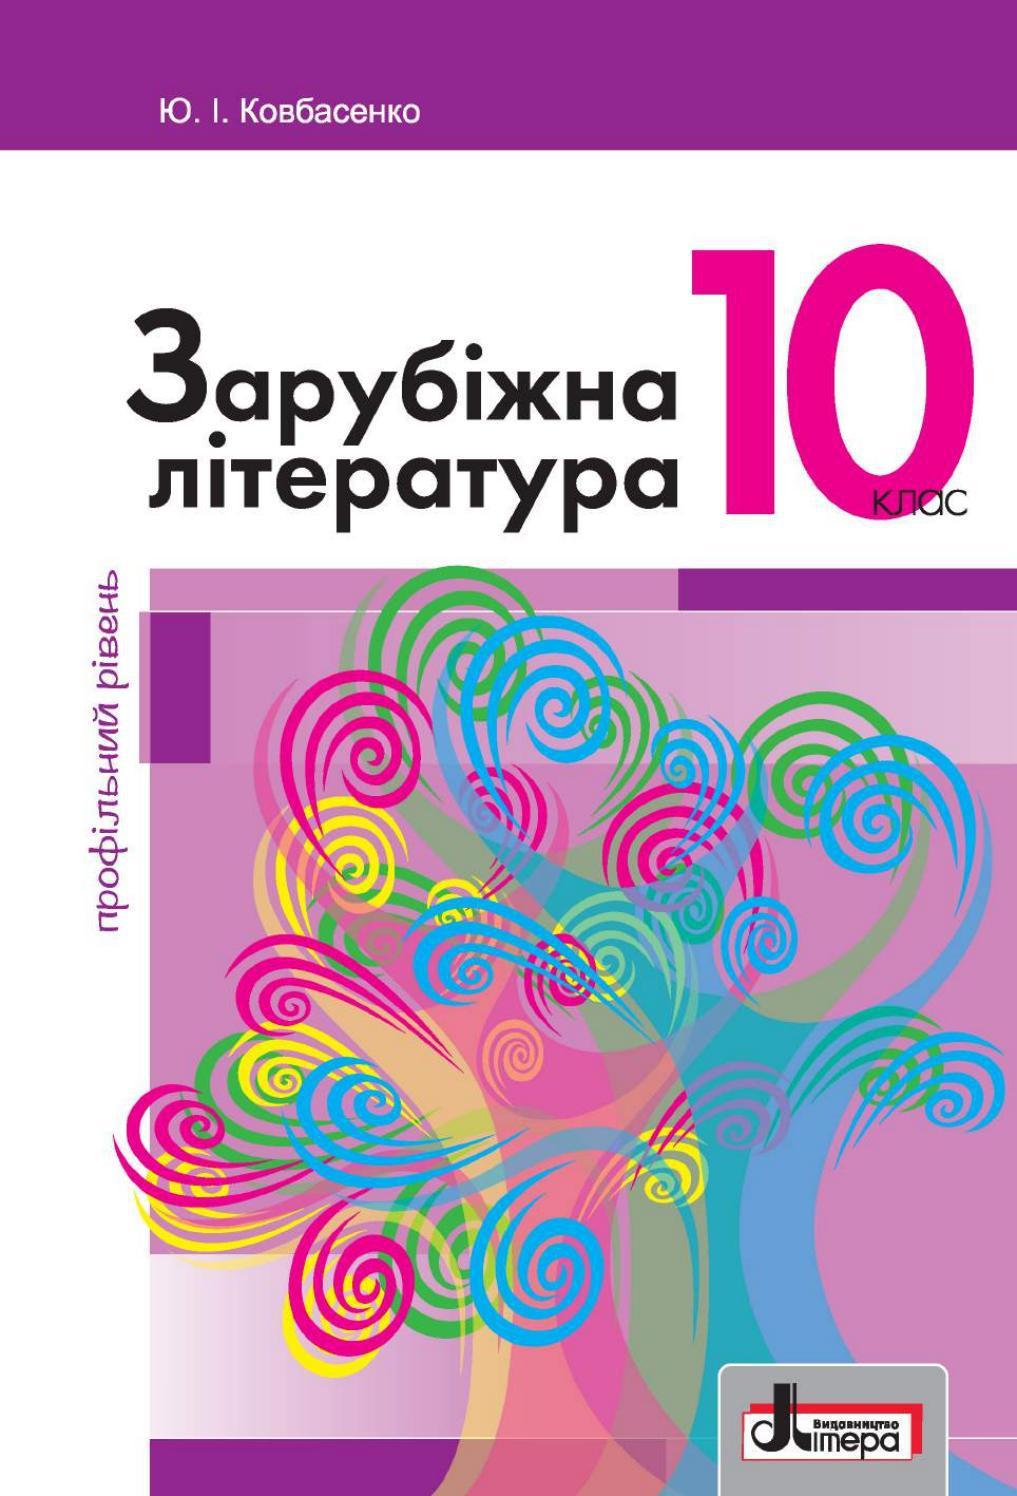 Зарубіжна література 10 клас Ковбасенко 2018 проф